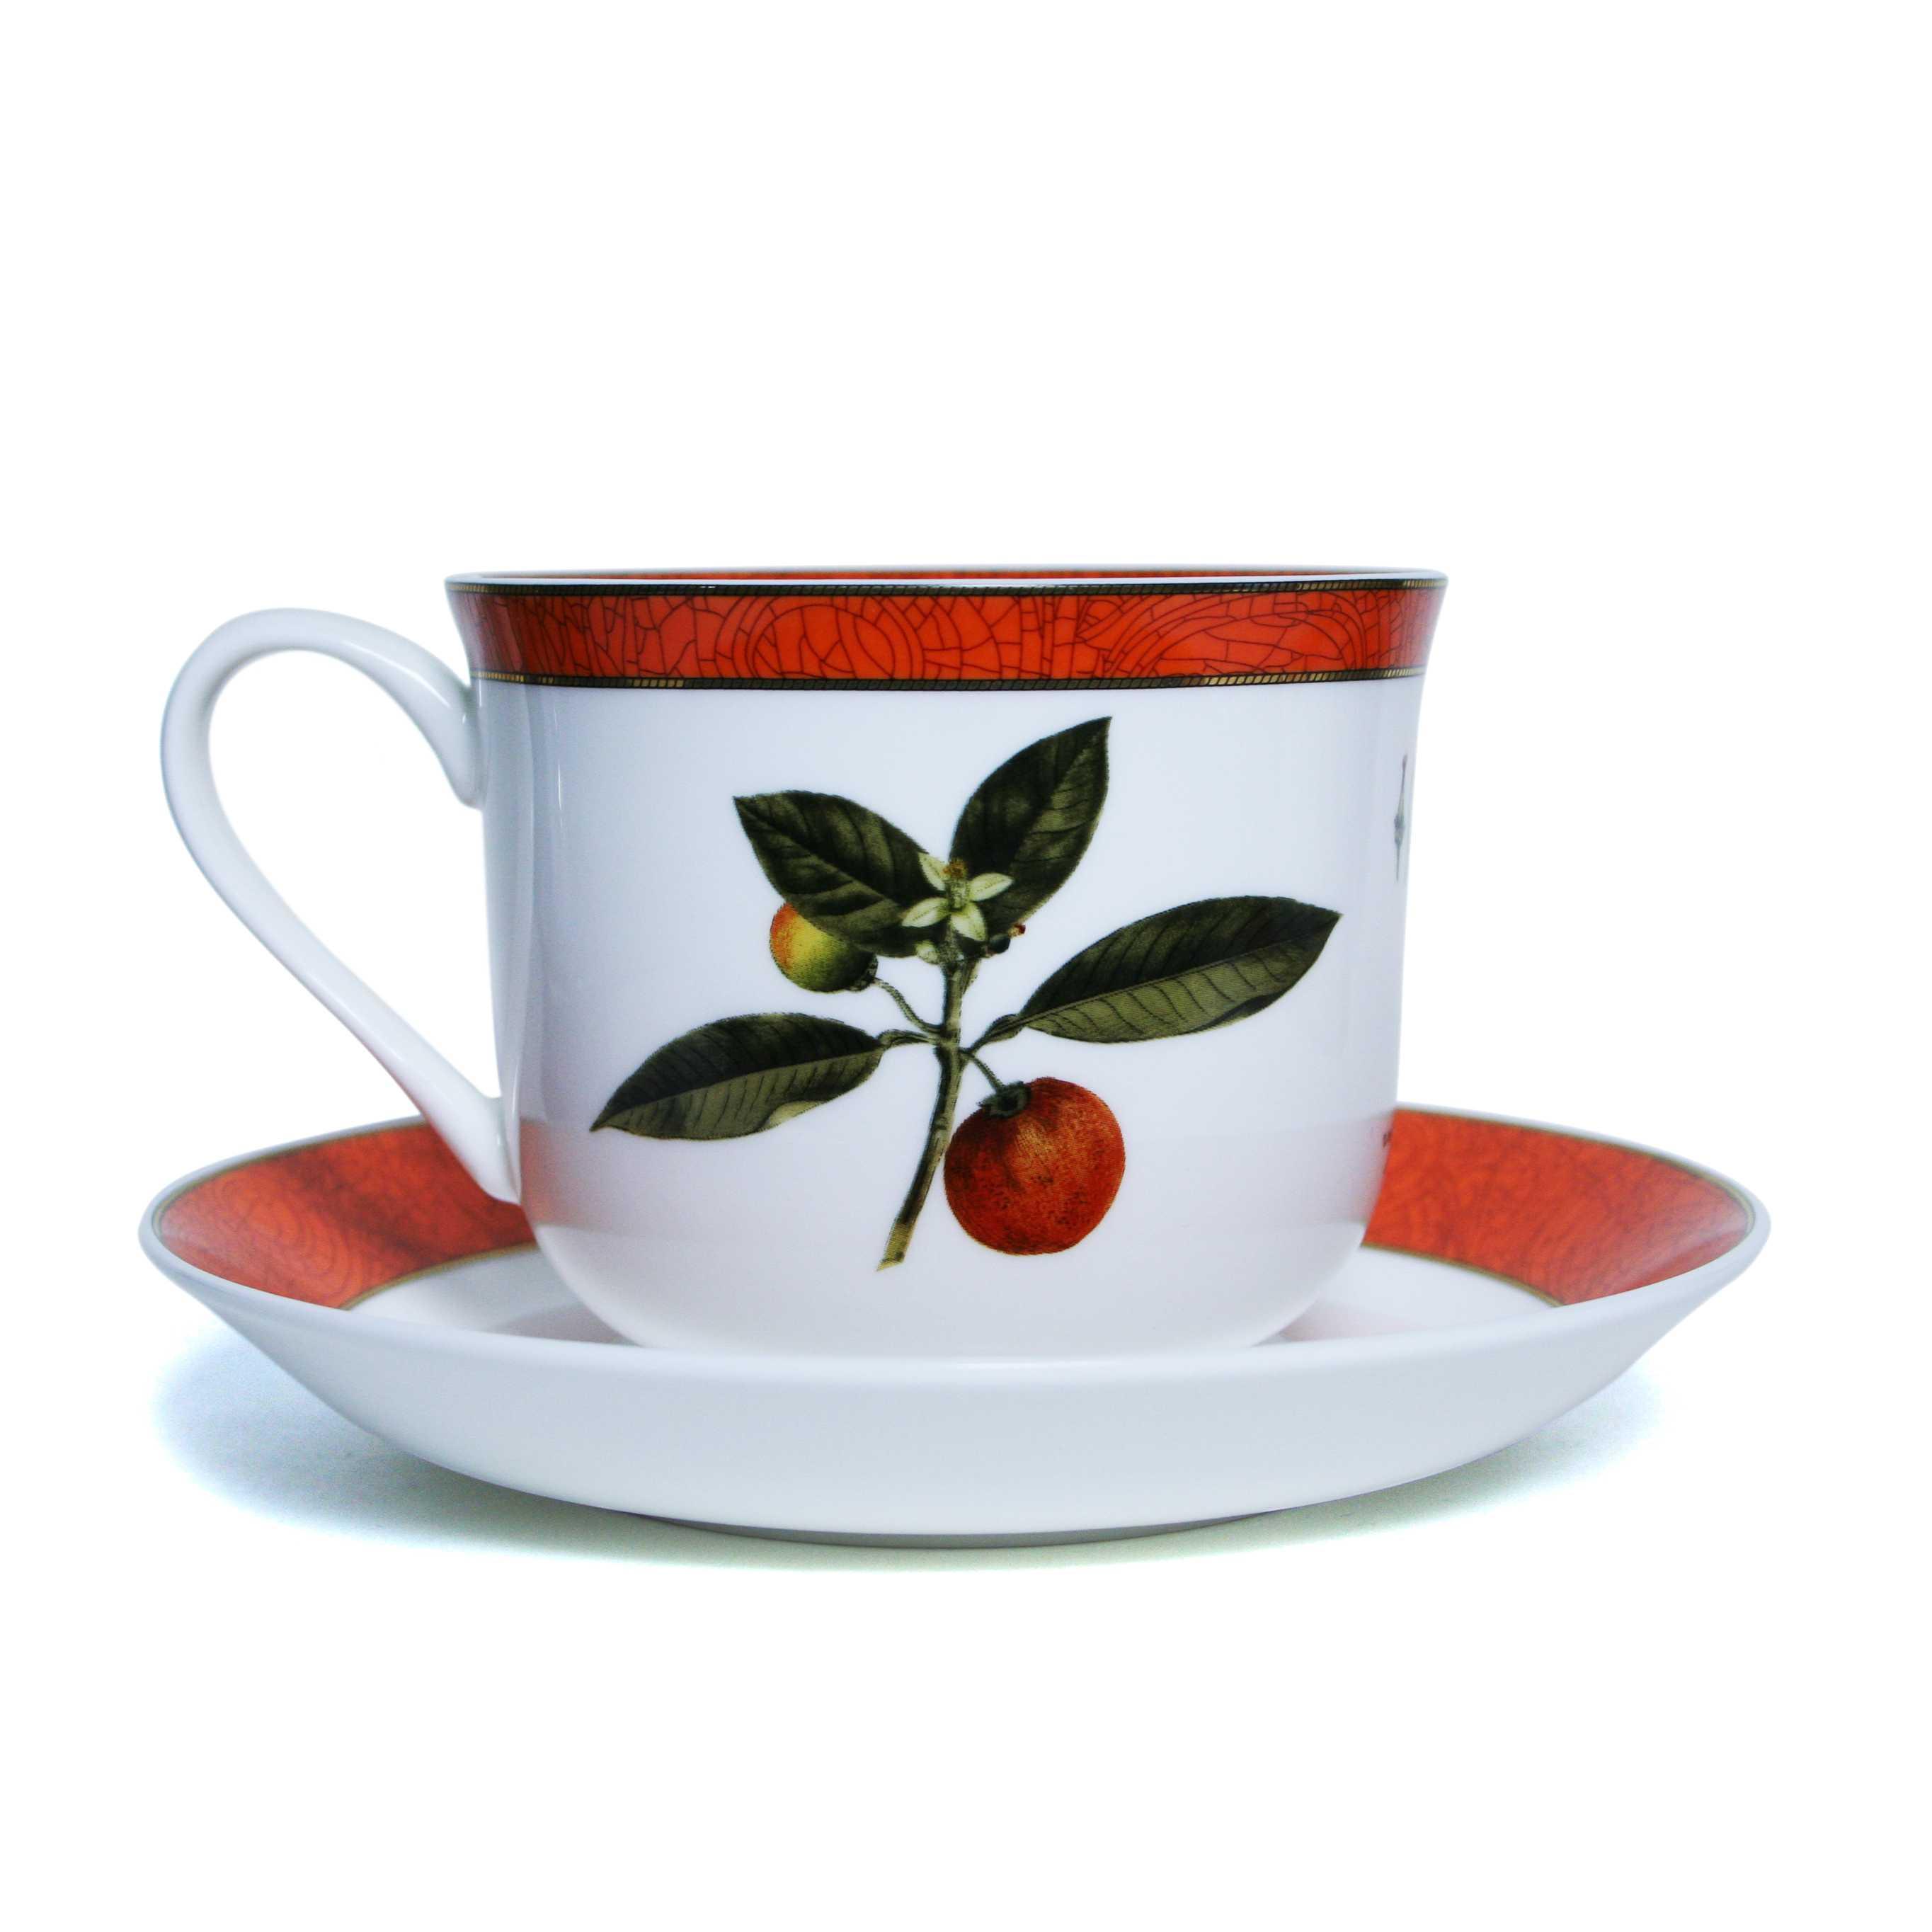 Фото - Пара чайная PrioritY Дыхание Прованса Апельсин 480 мл пара чайная priority дыхание прованса вишня 480 мл